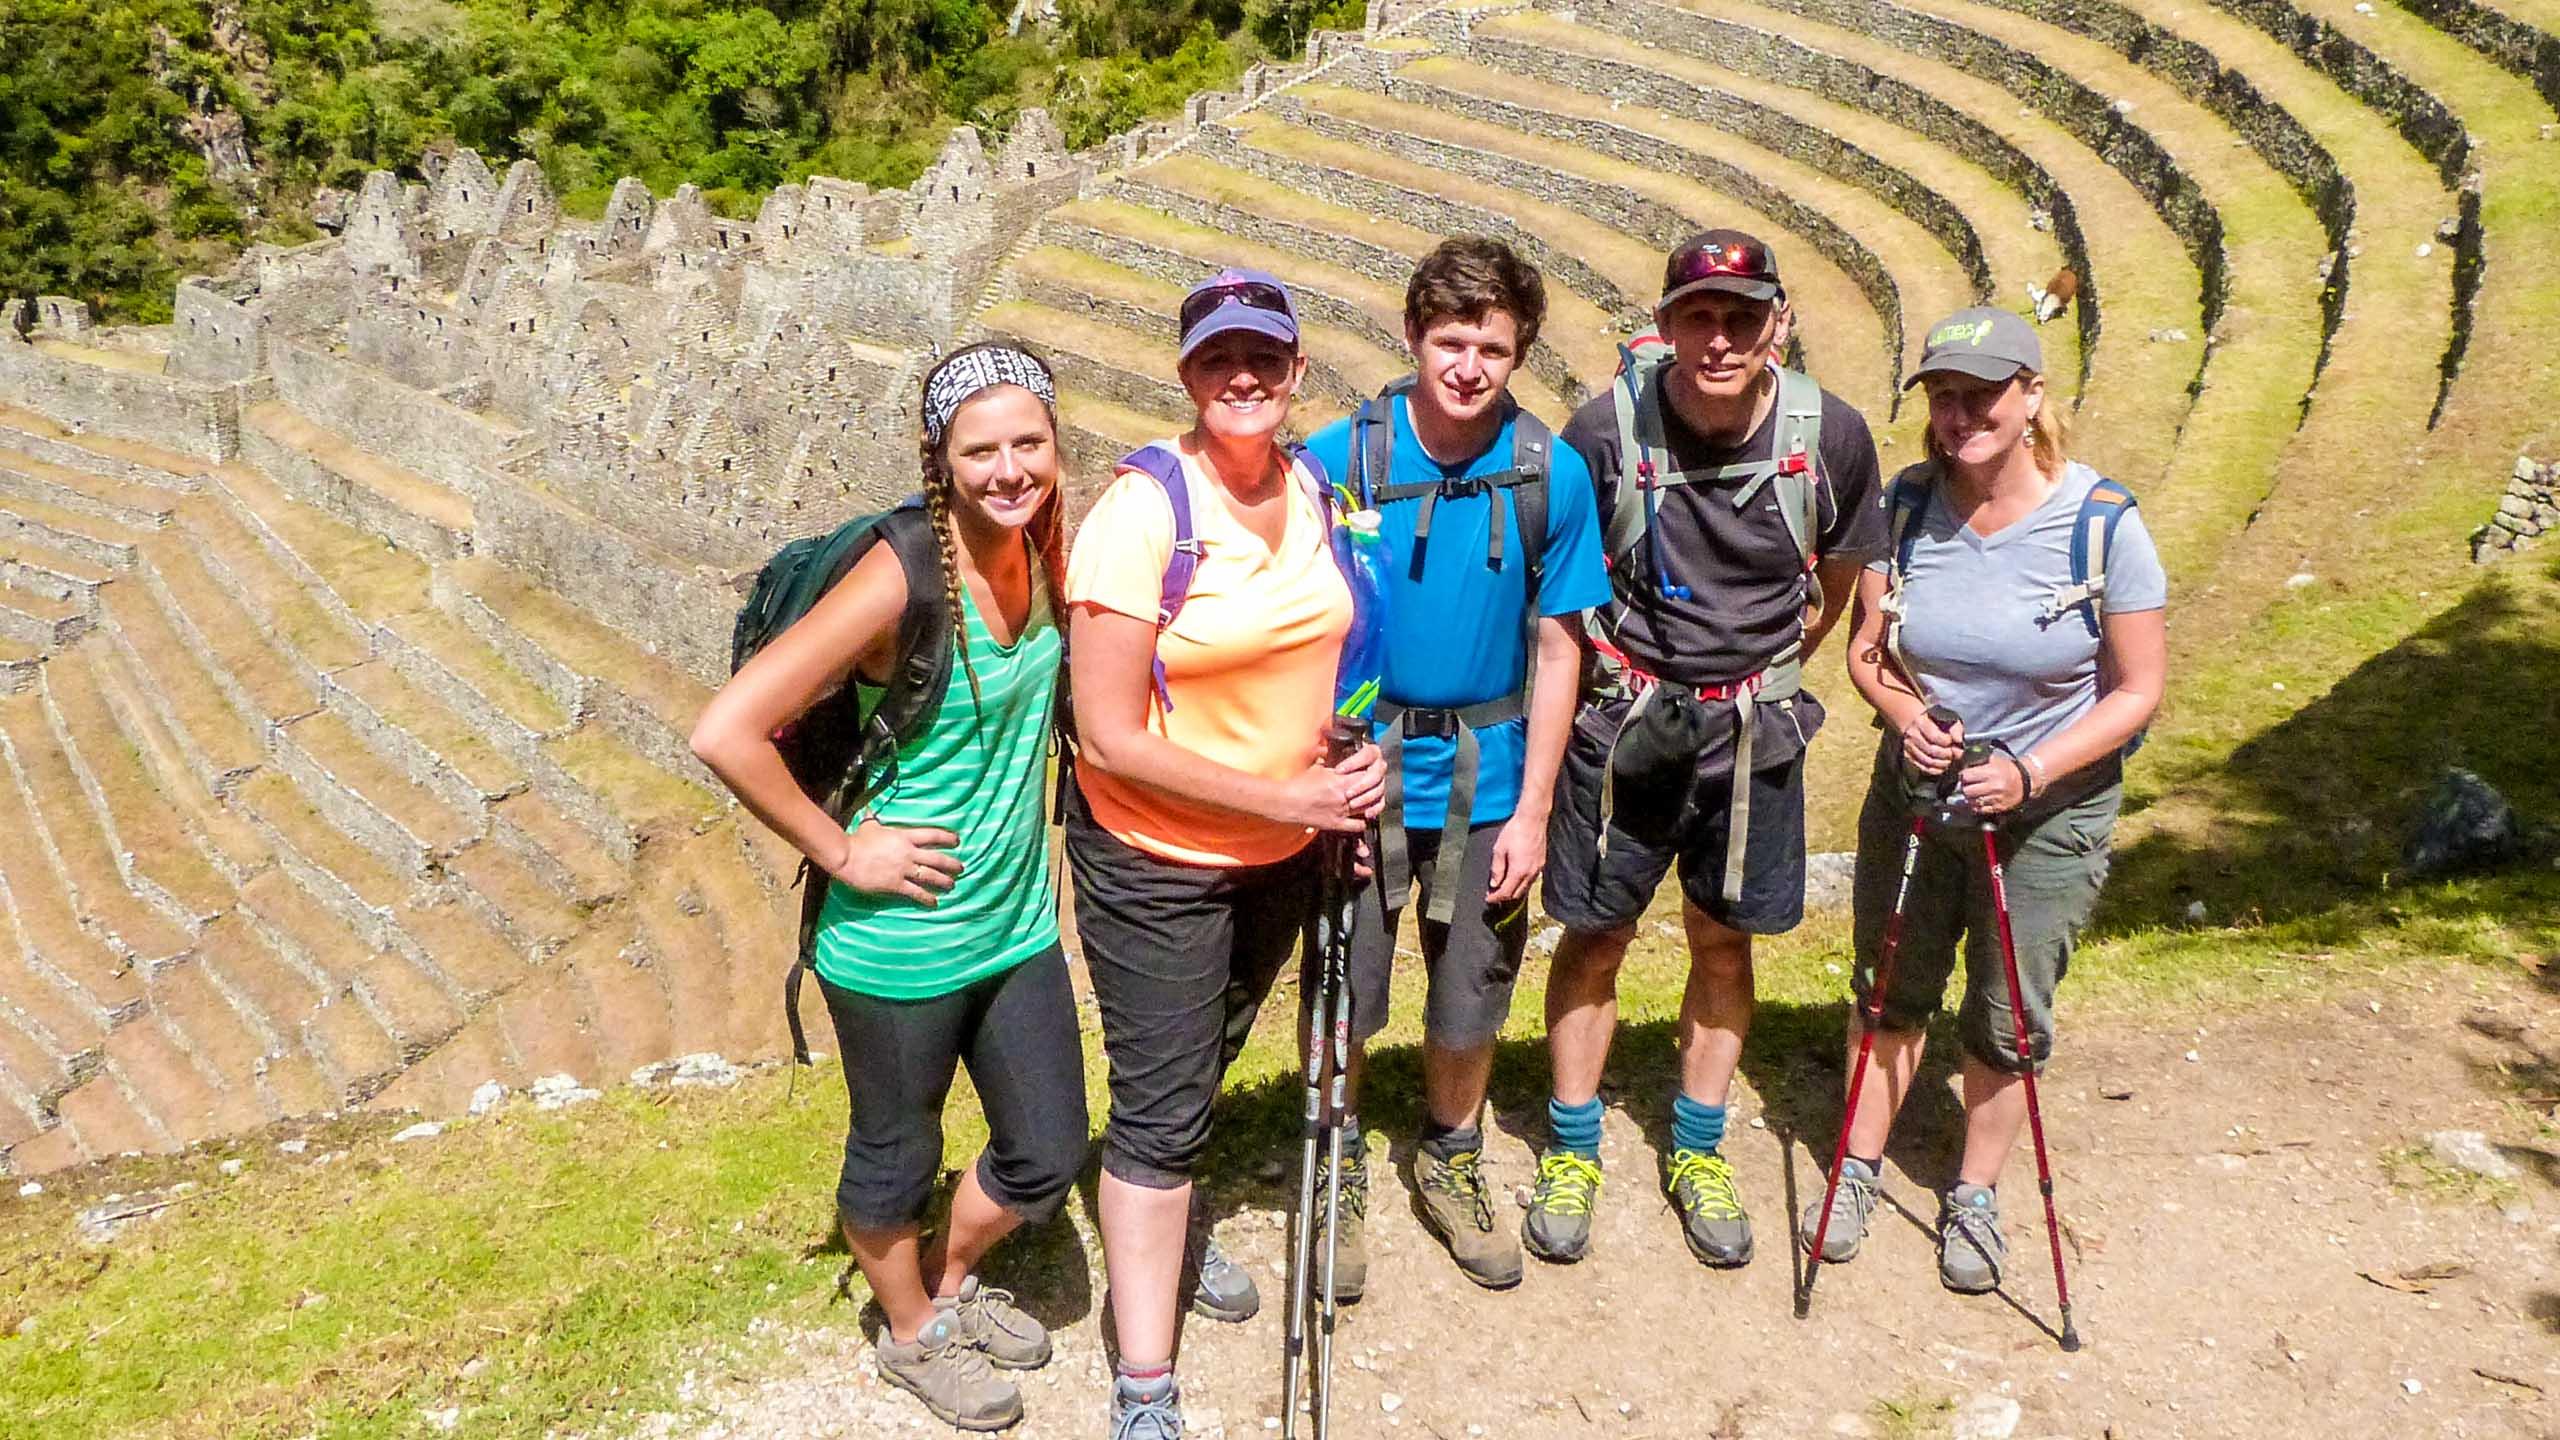 Group of teens pose on Peru hiking trip